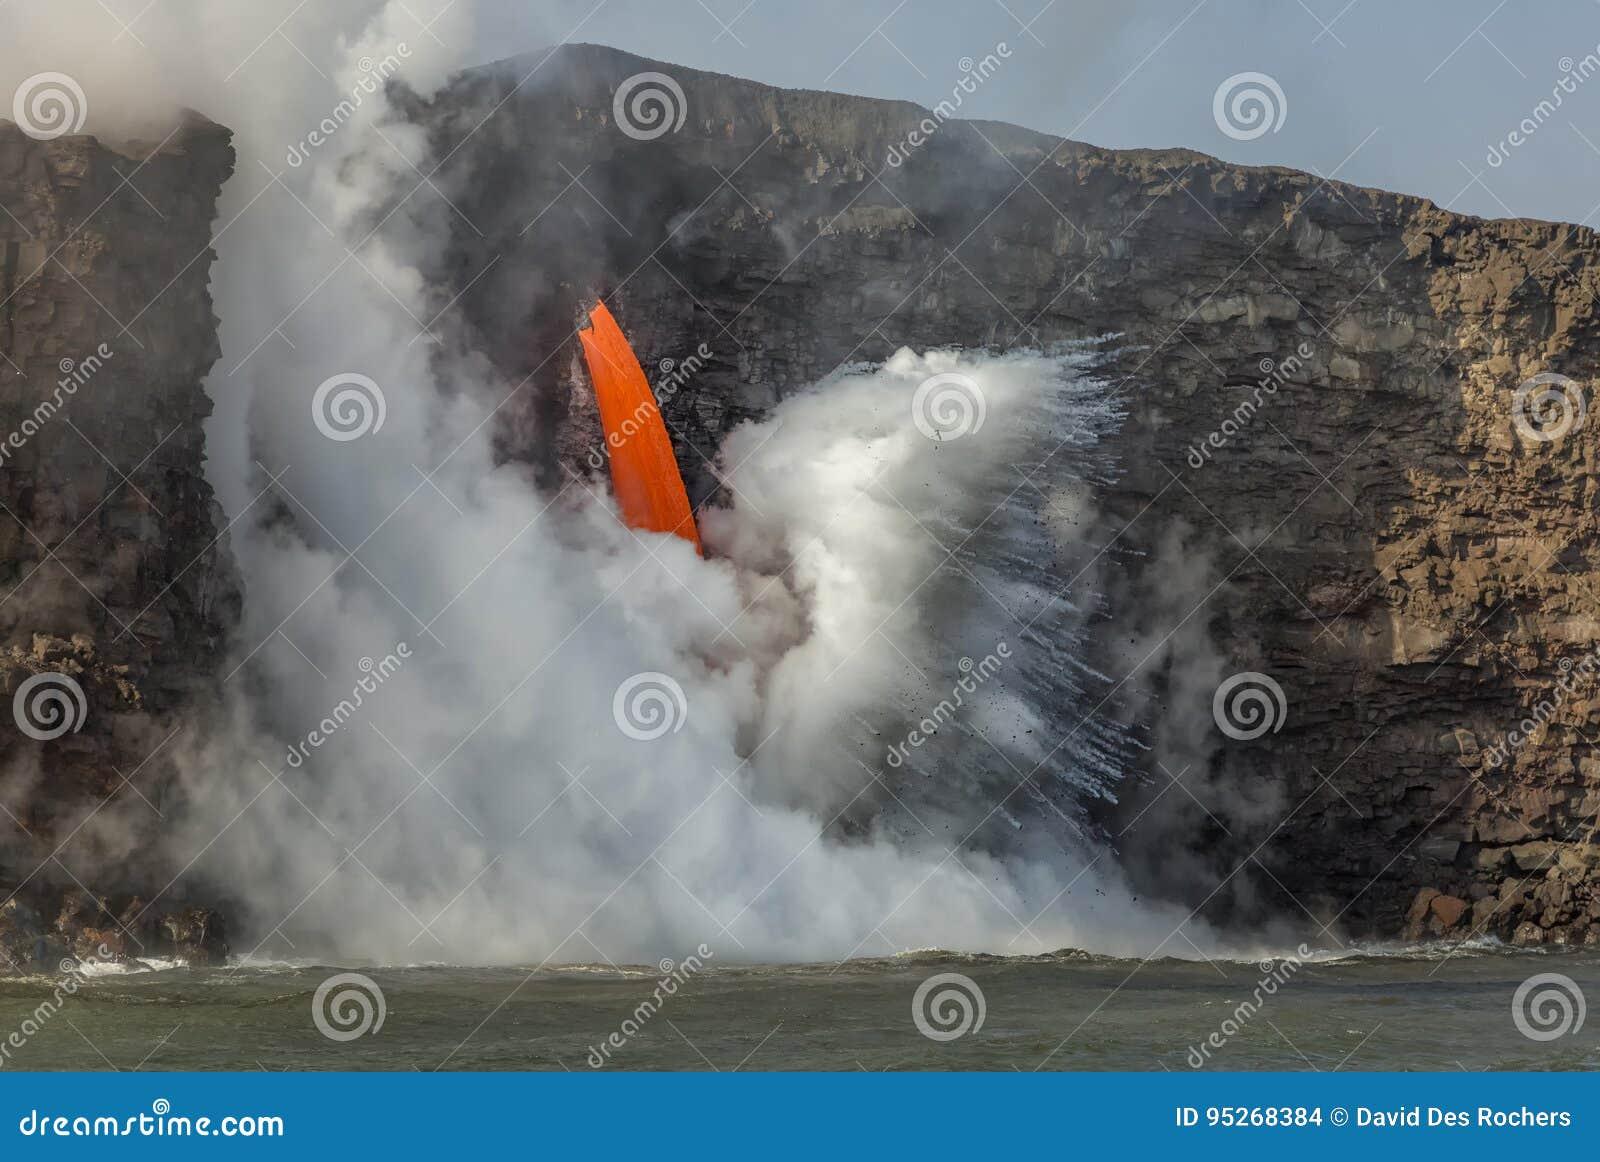 Fluxo de lava da mangueira de fogo